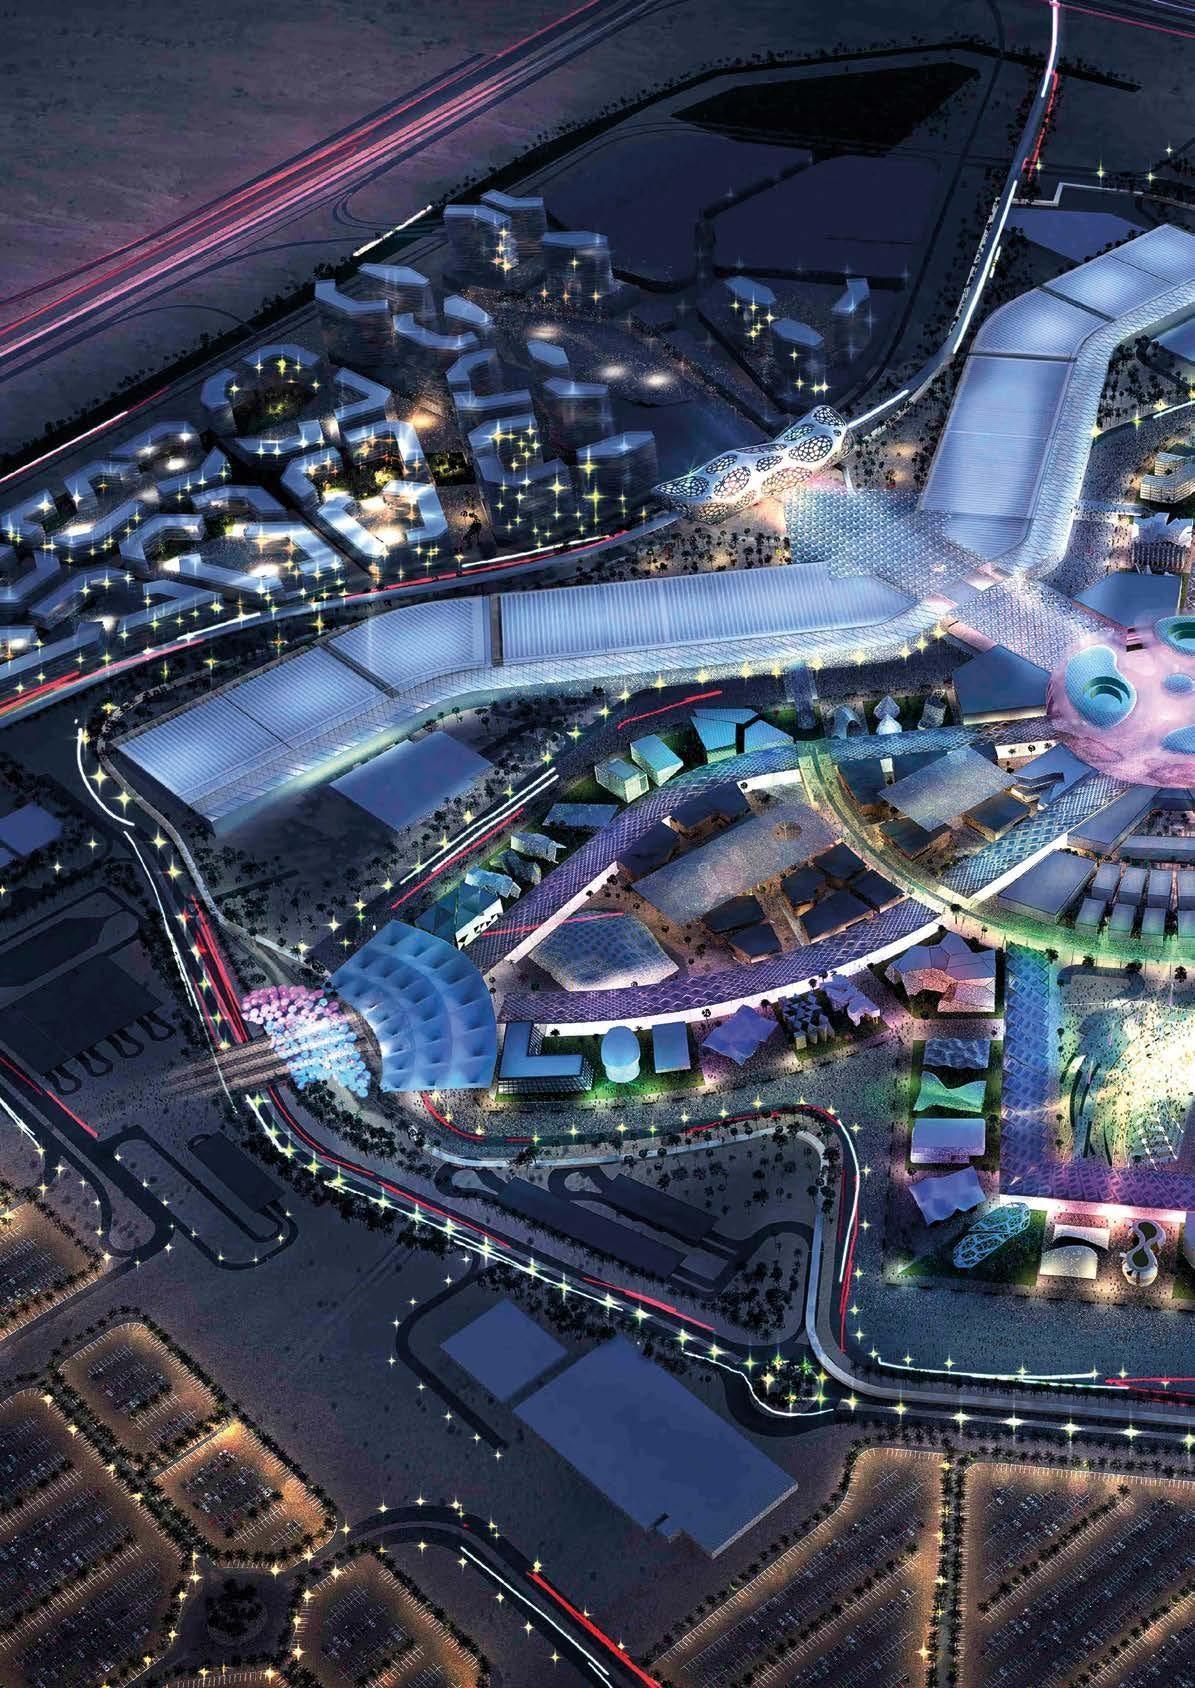 Page 72 of Expo 2020 Dubai